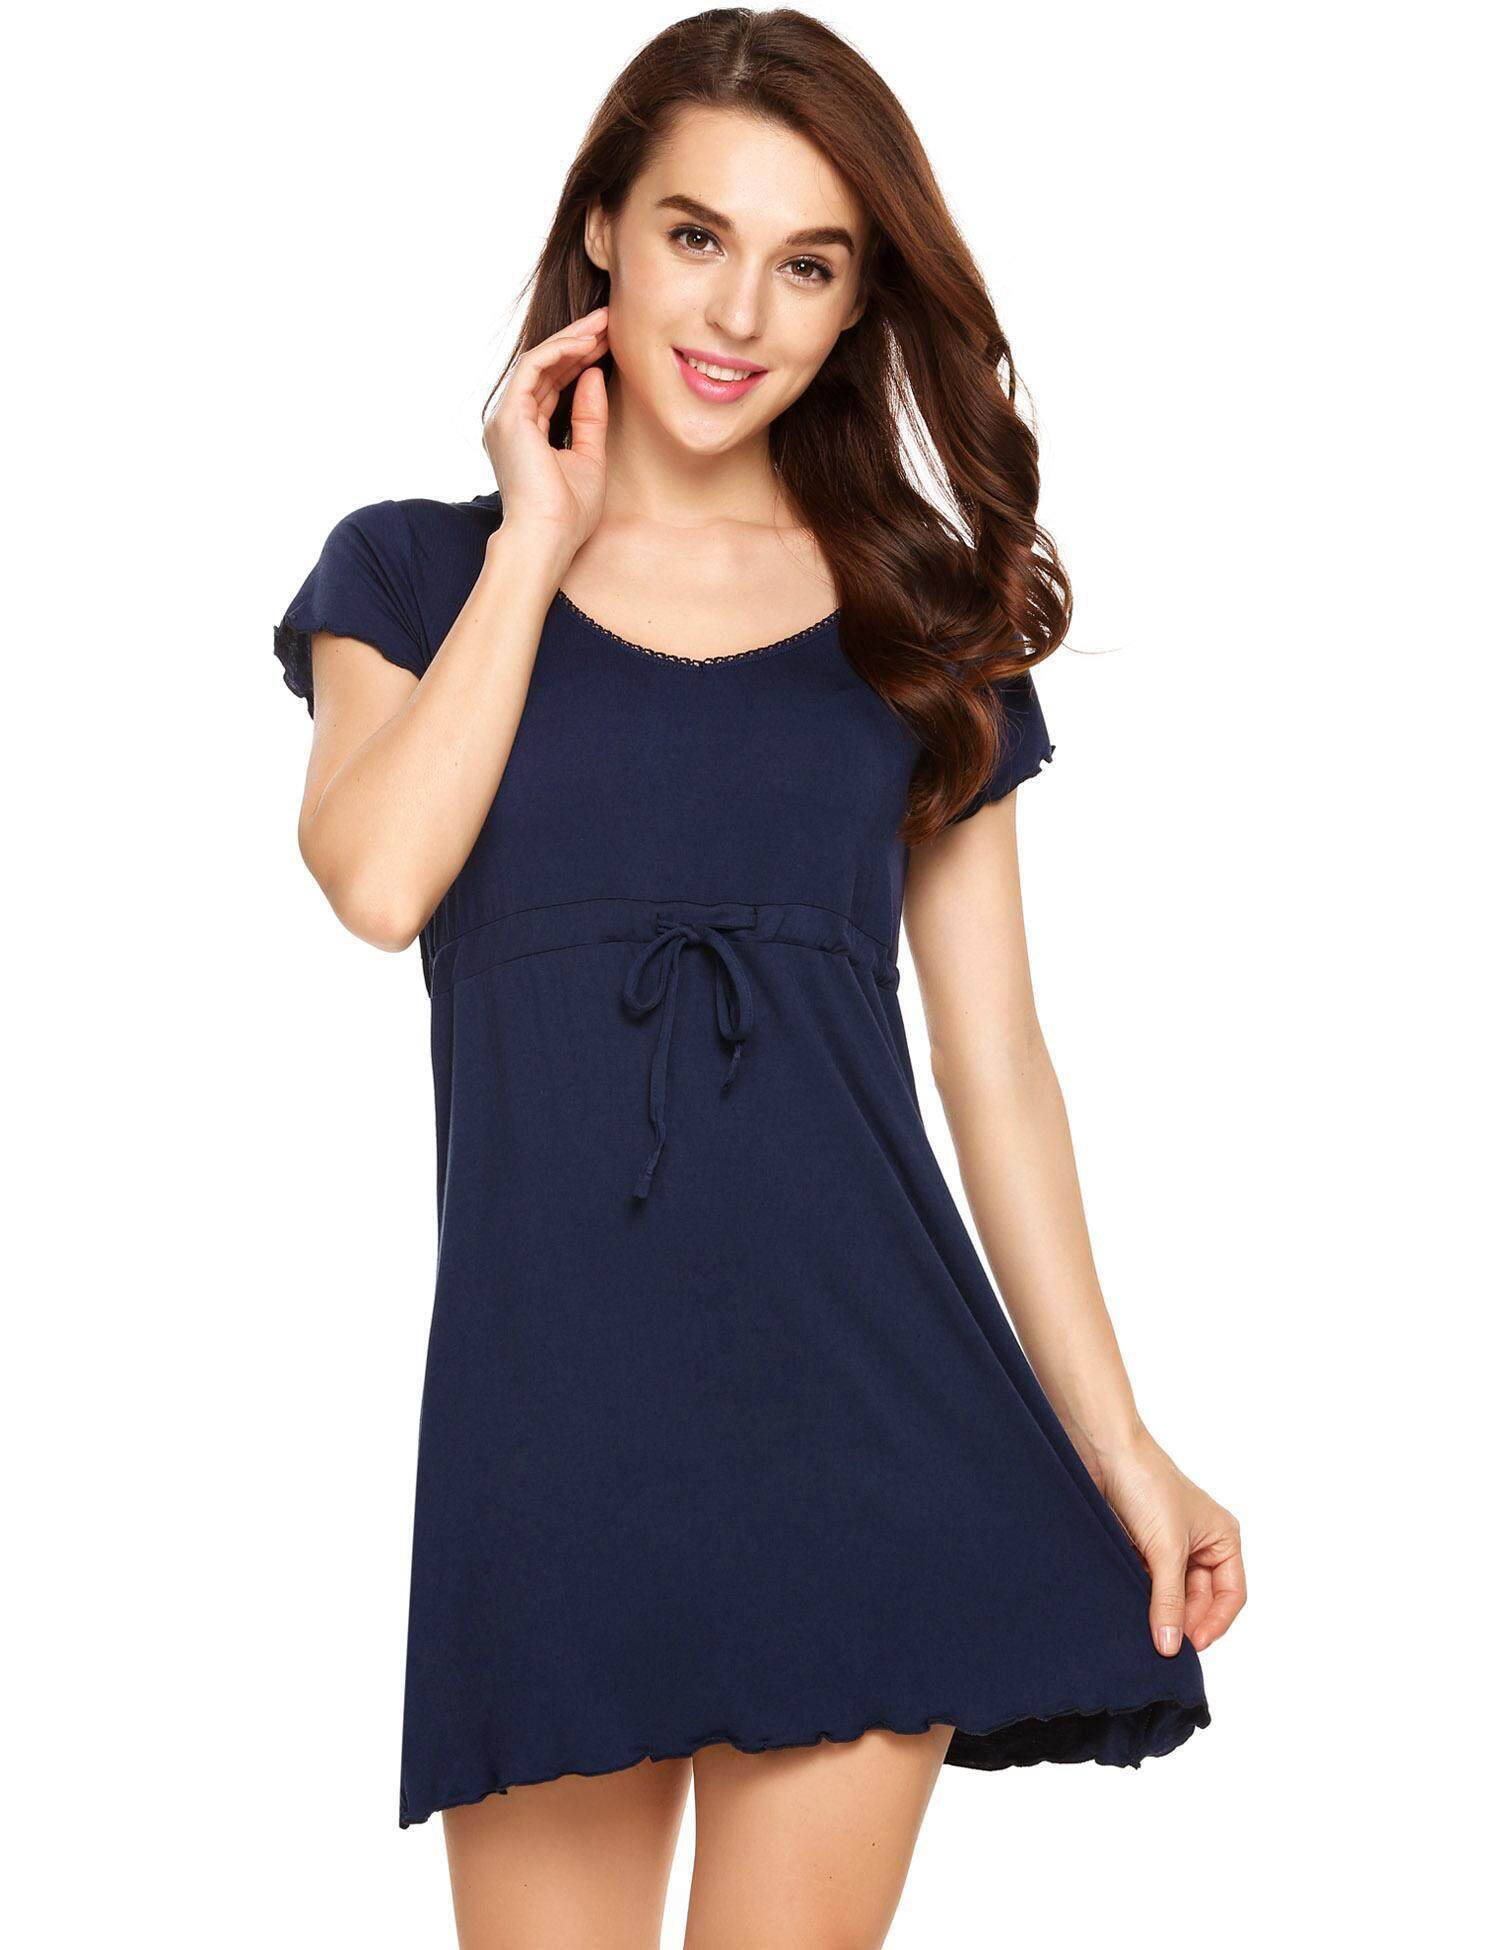 80126148db02 Promotion Womens Short Sleeve Pajamas Solid O Neck Nightgown Sleepwear  Drawstring Loose Dress (Navy Blue